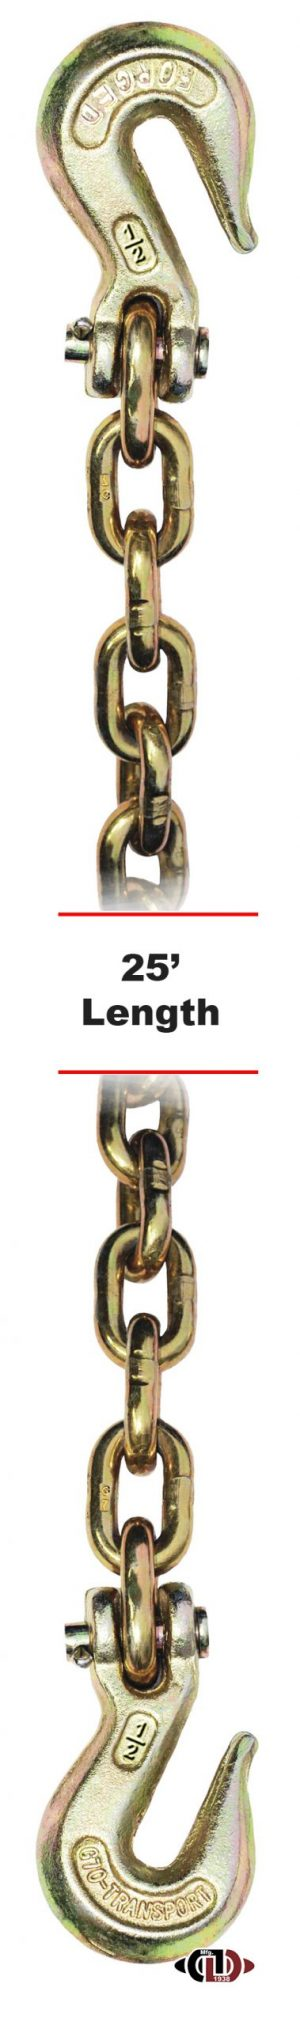 "G-70 1/2"" x 25' Chain w/ Clevis Grab Hooks on Both Ends DBC-12X25-G7-CGH (Copy)"